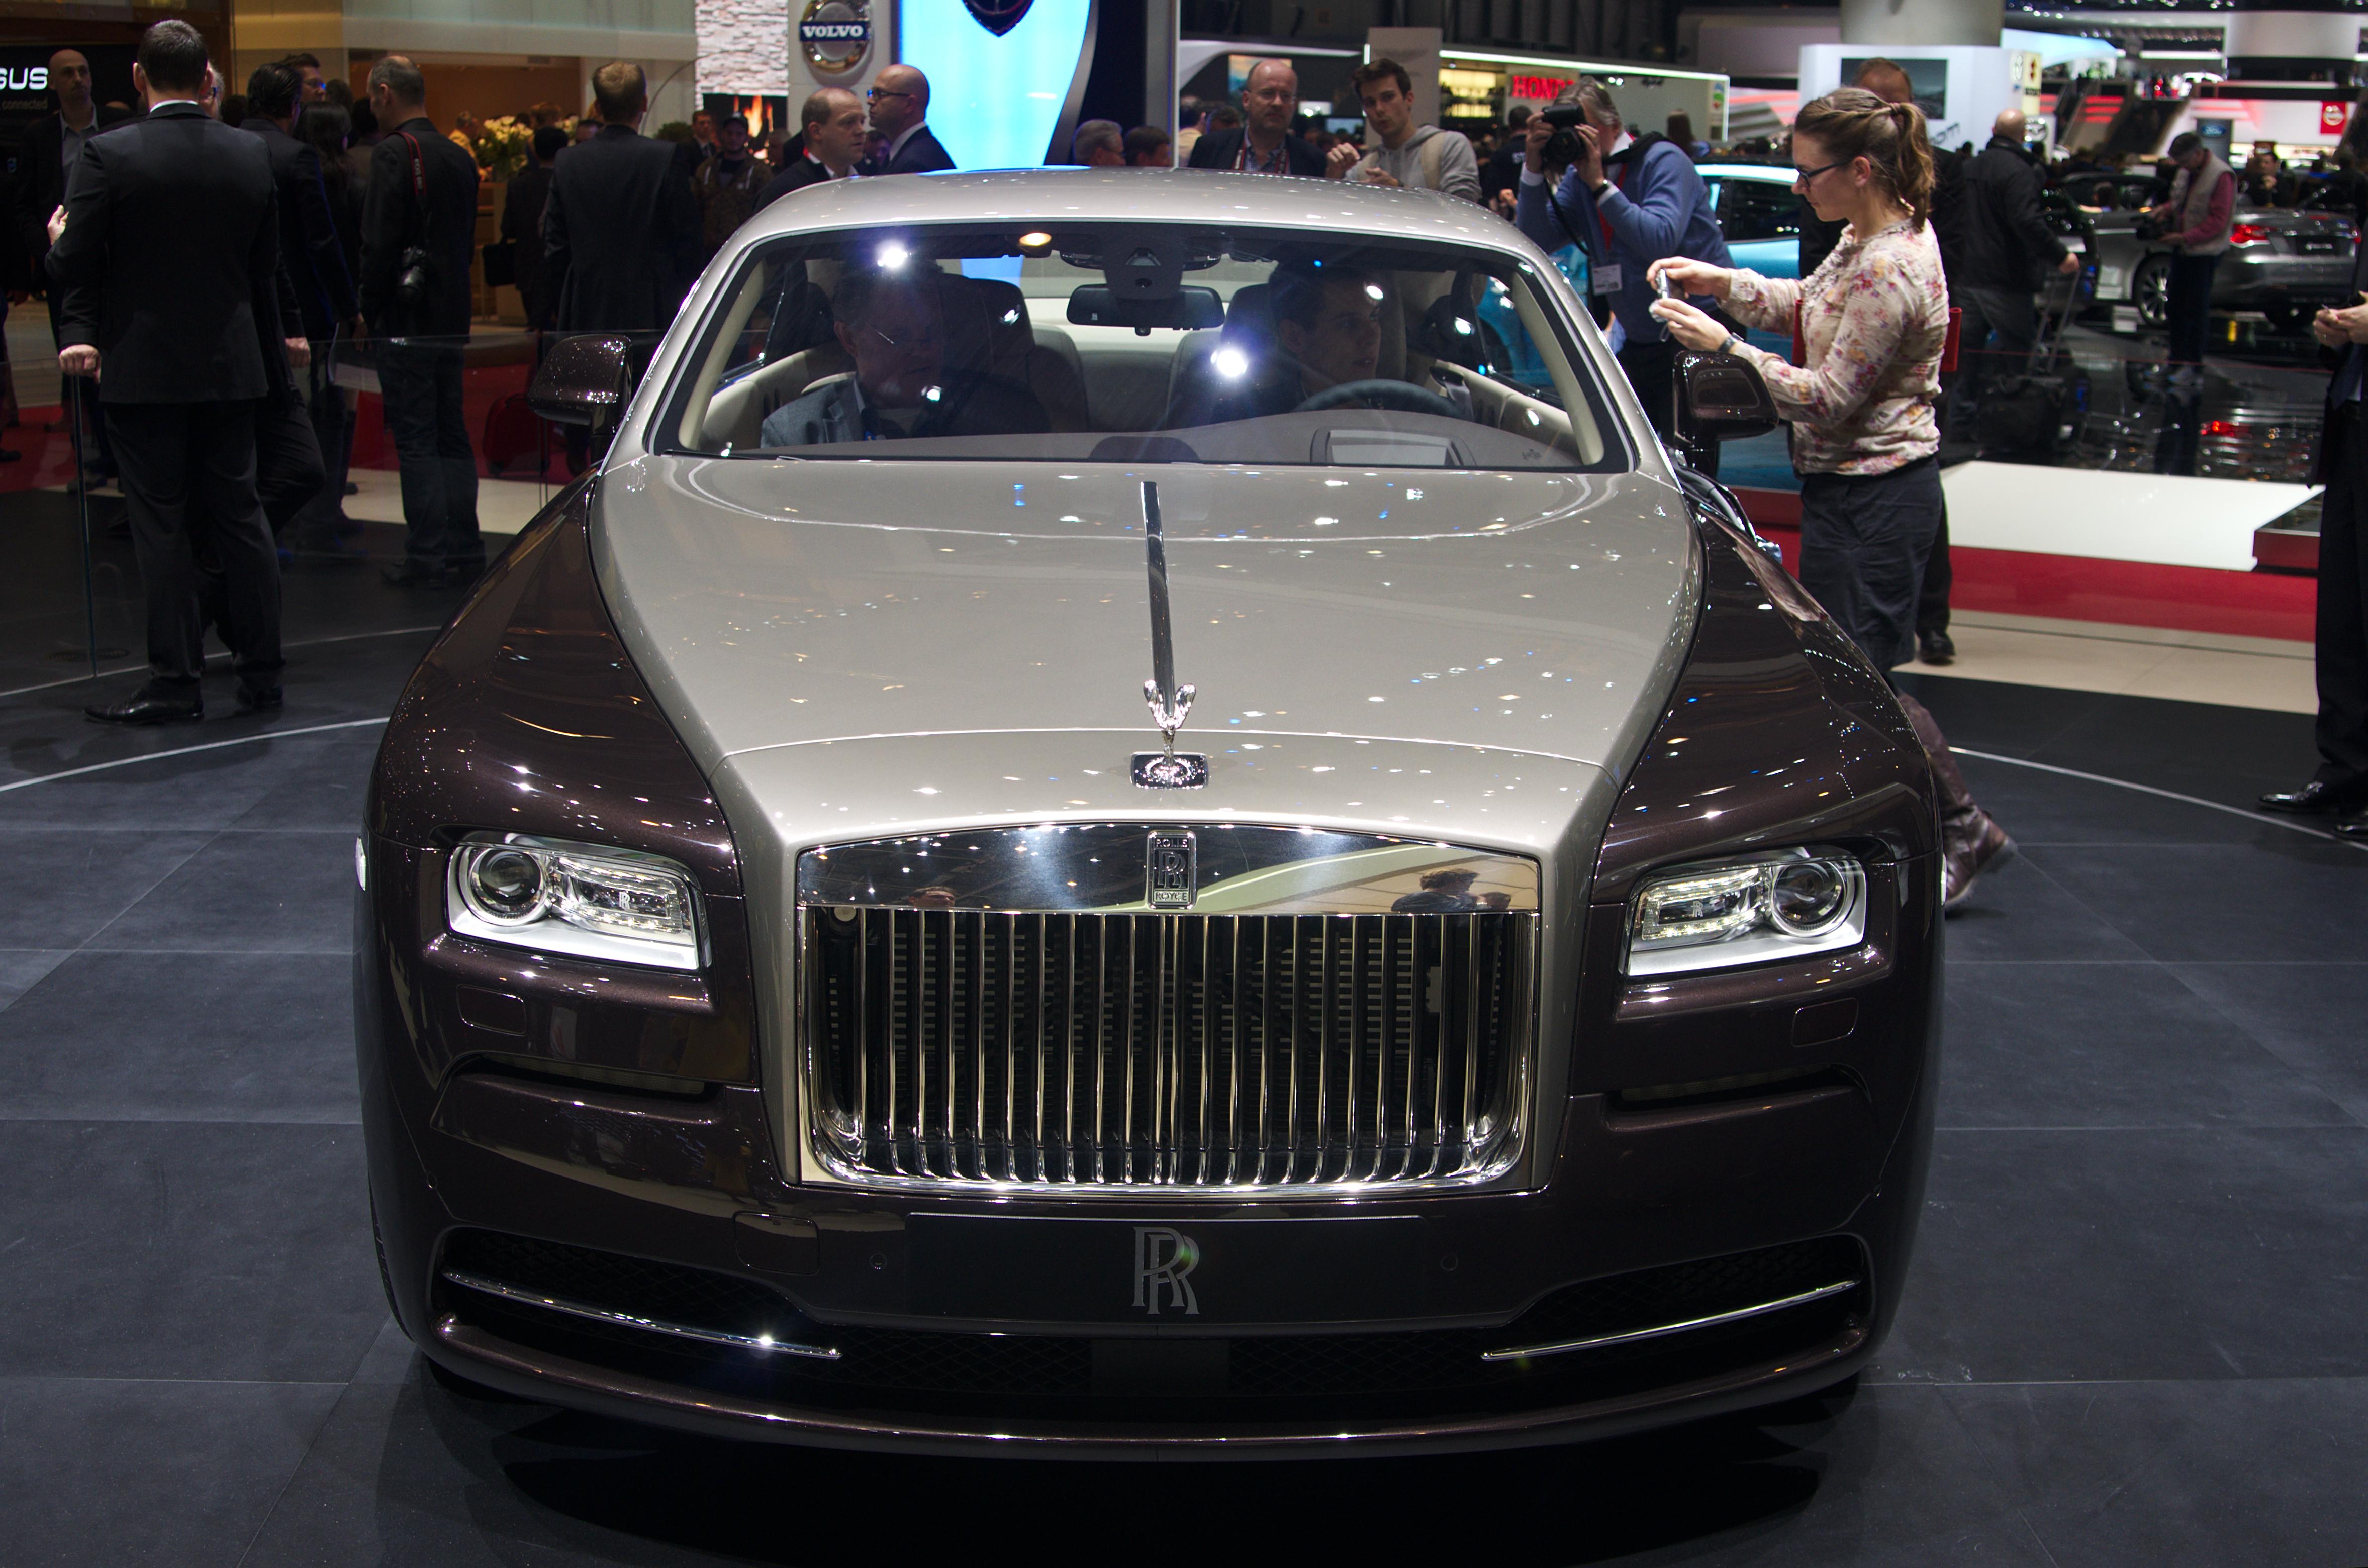 Rolls Royce Wraith Wikipedia 2013 Rolls-royce Wraith